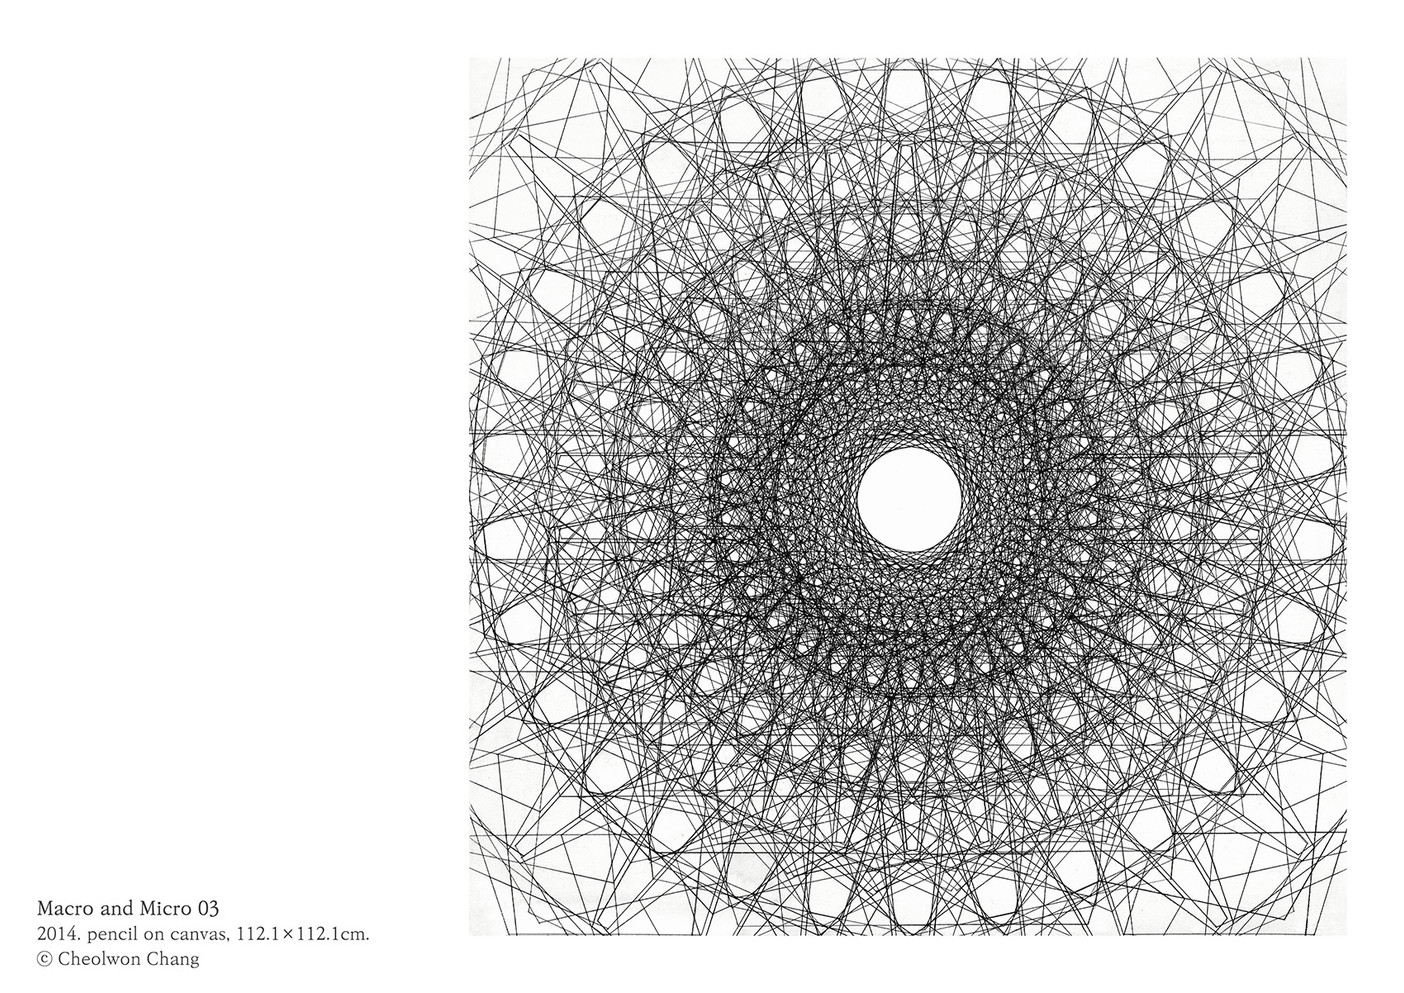 pattern_cheolwon chang (8).jpg